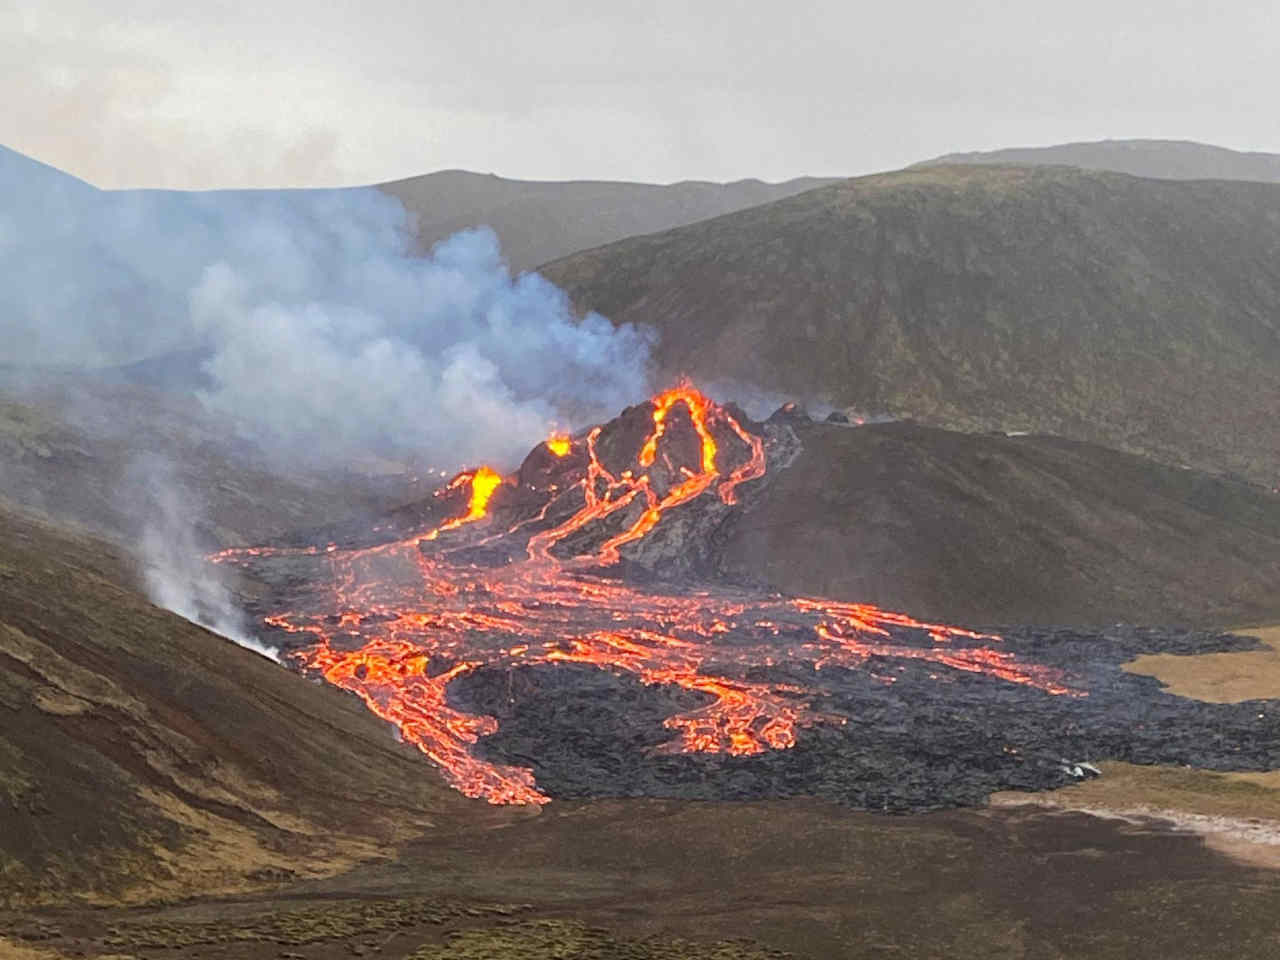 vulcano islanda - Vulcano si risveglia dopo quasi 1000 anni. Paura a Reykjavik